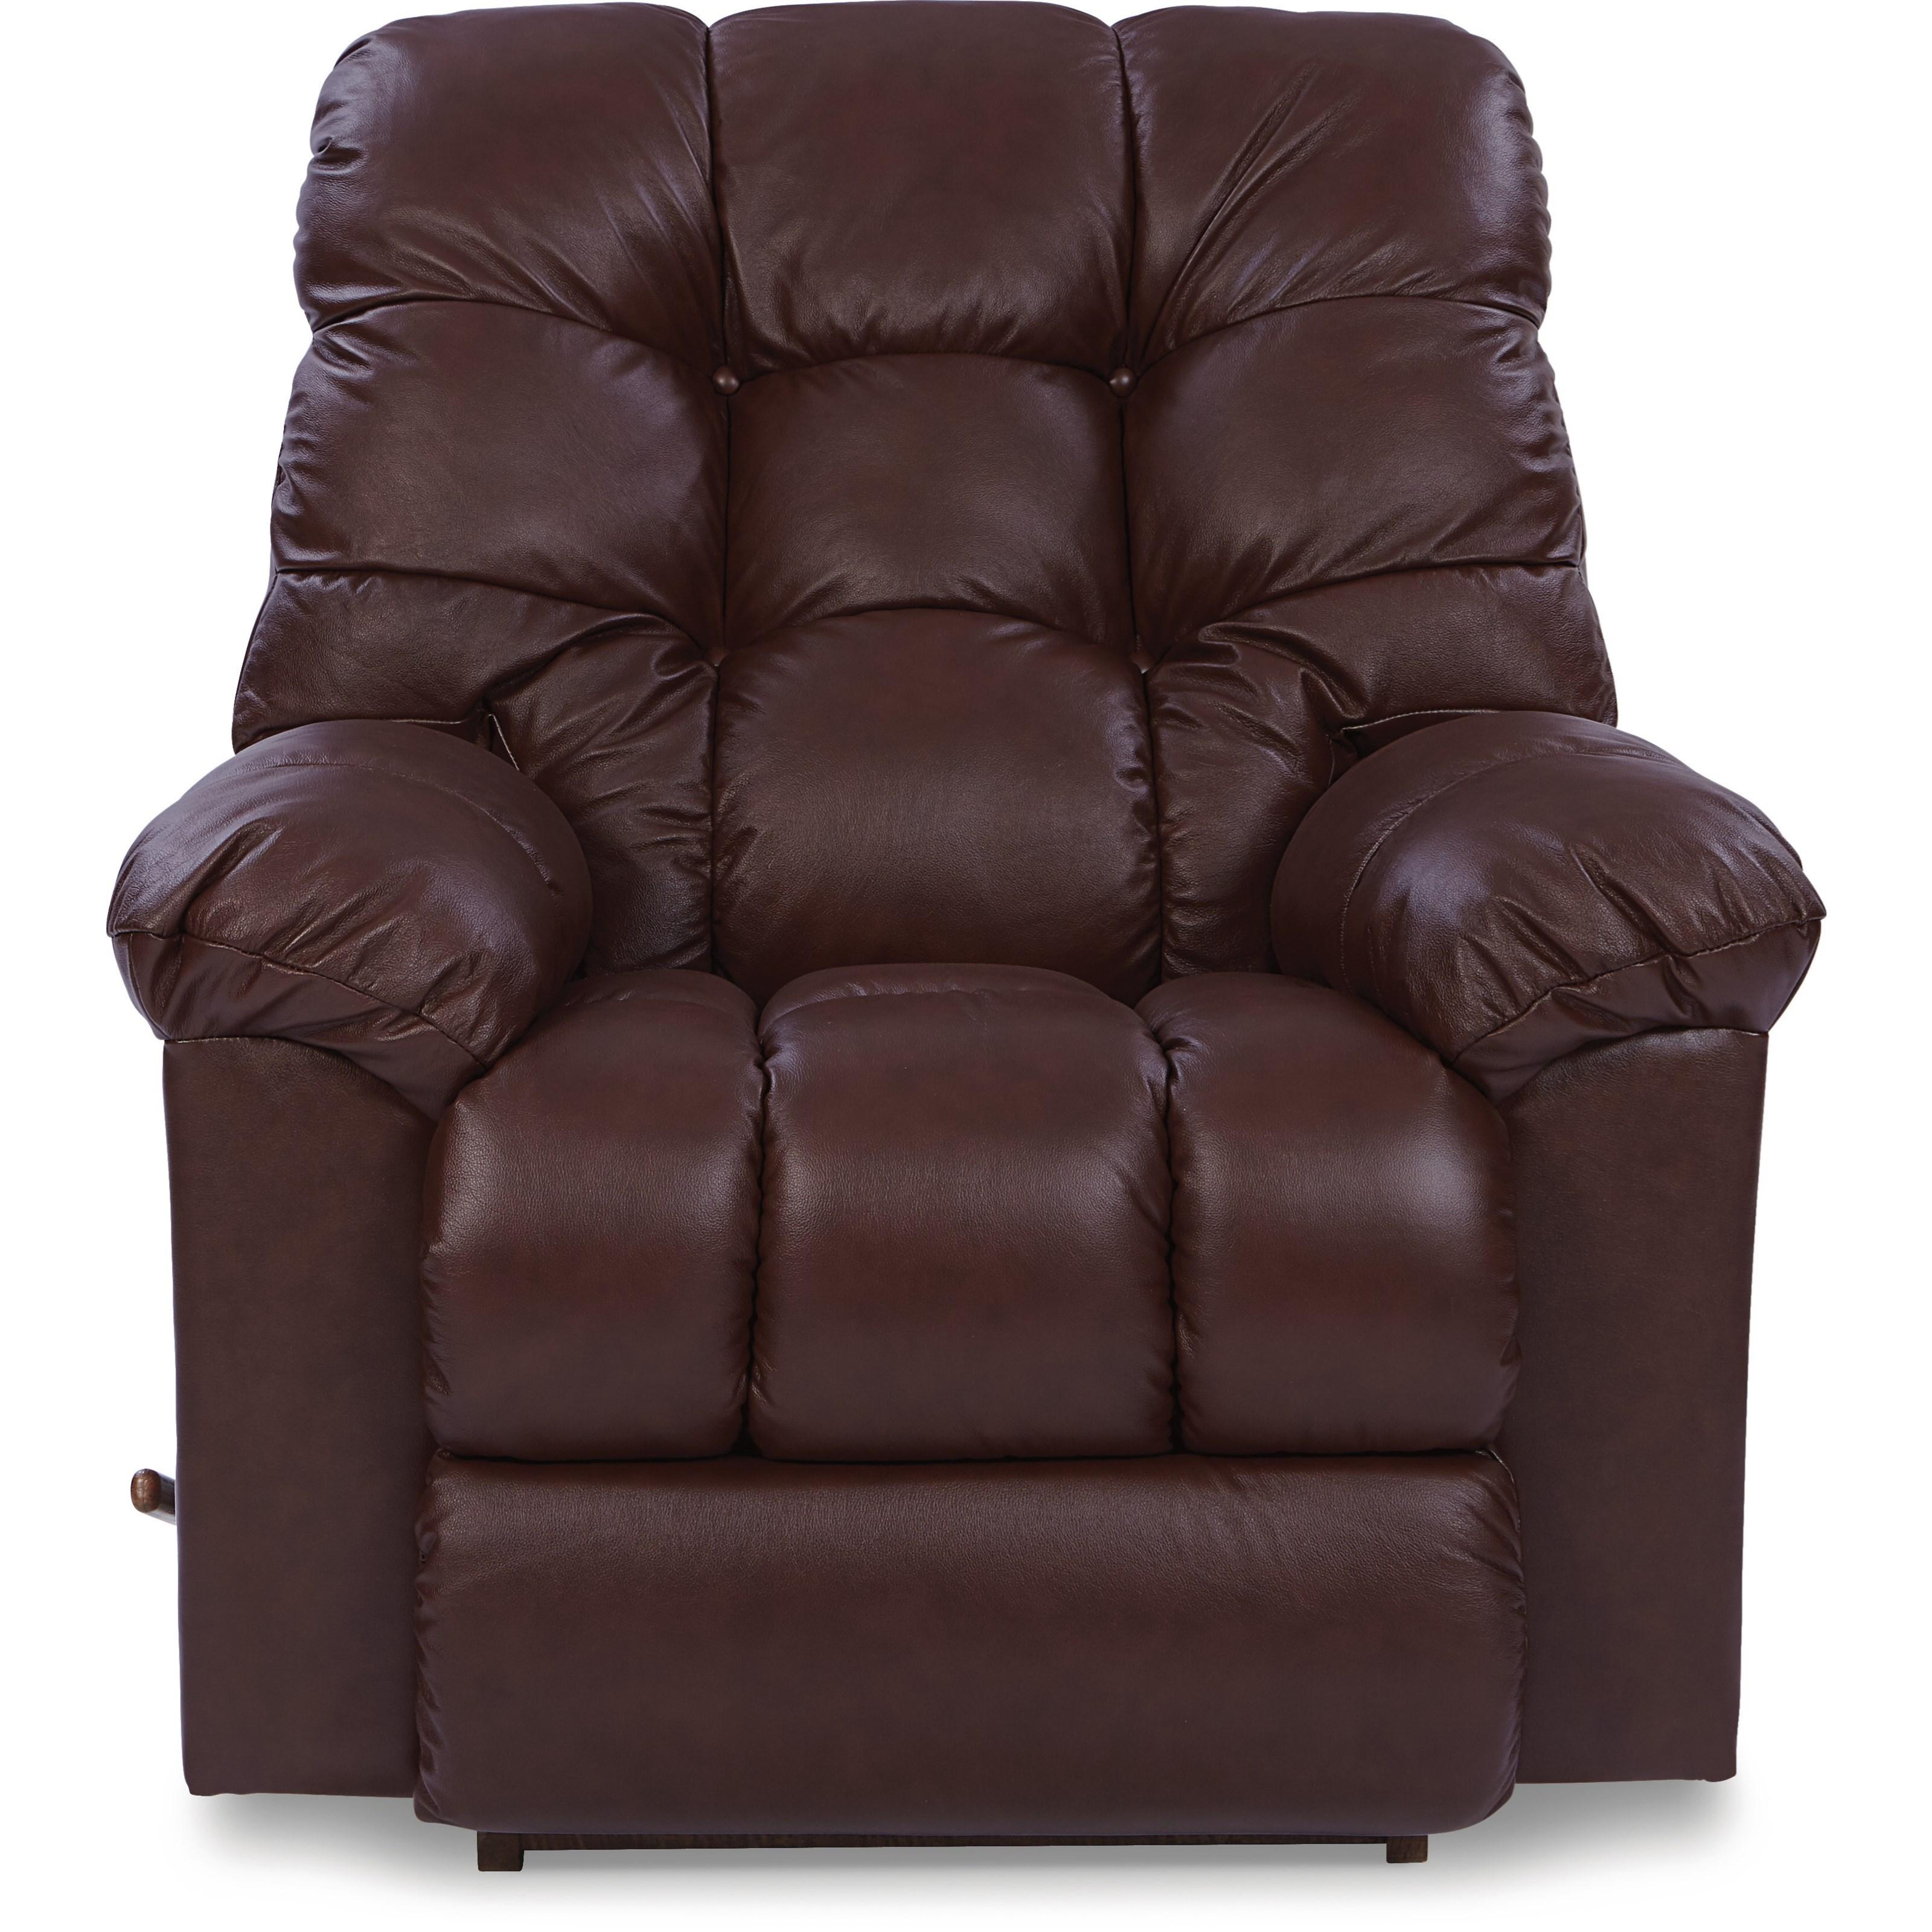 La Z Boy Gibson Reclina Rocker 174 Reclining Chair Knight